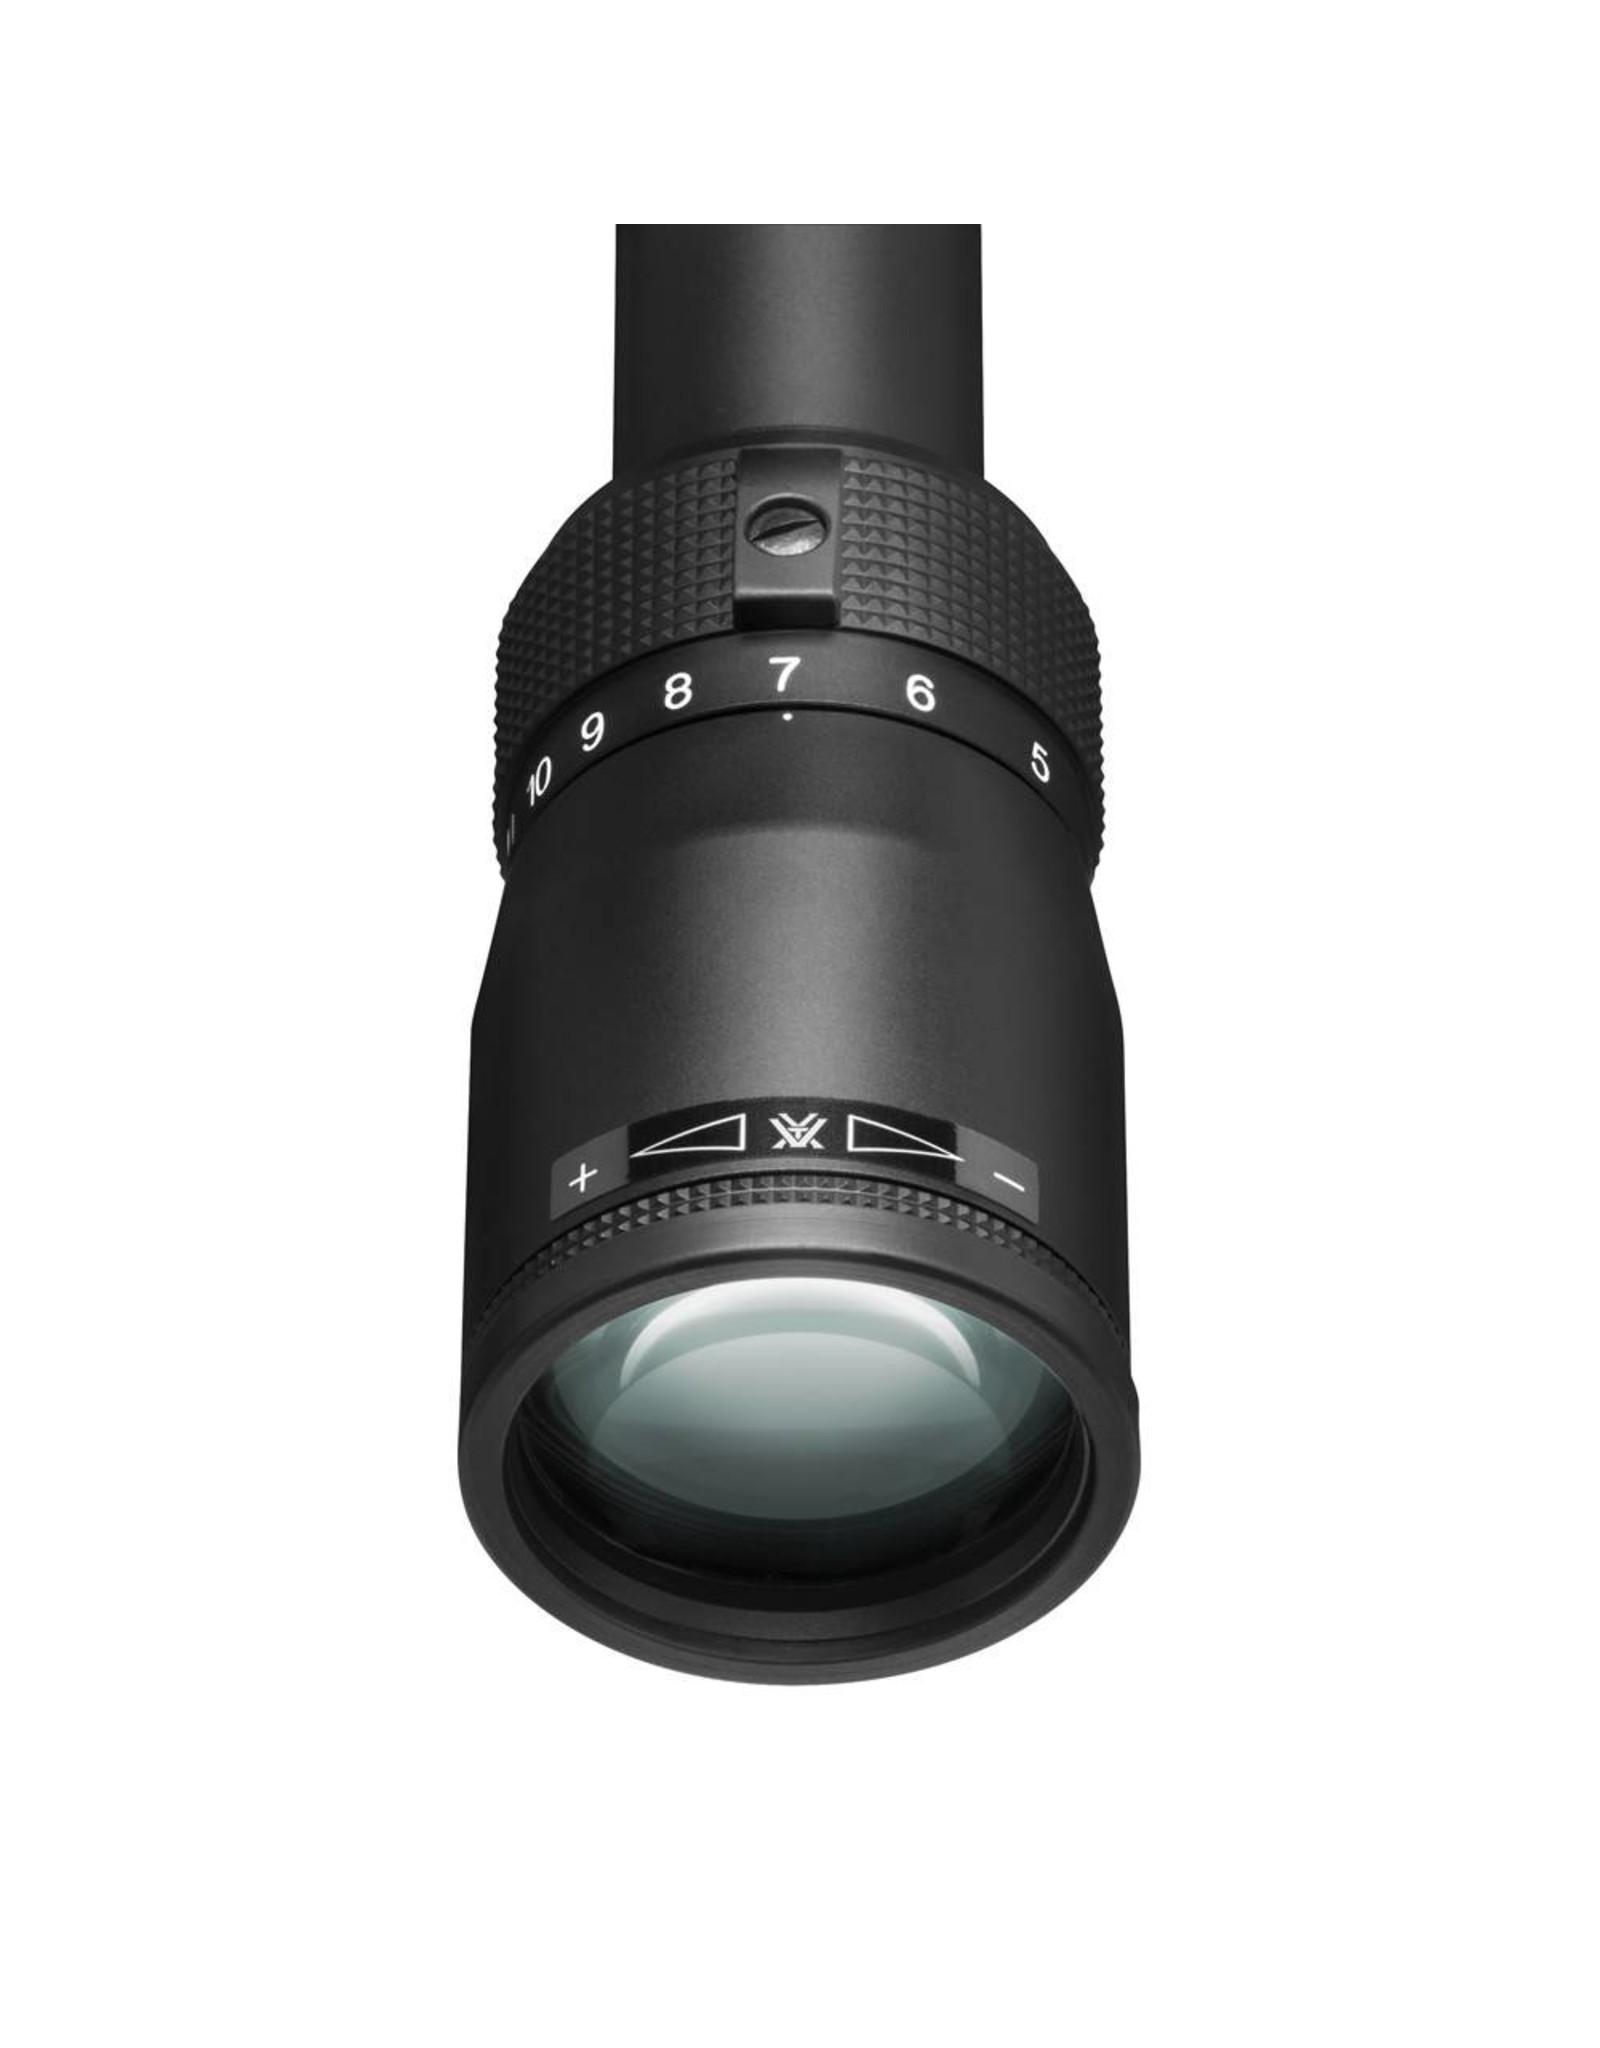 Vortex Vortex Diamondback 4-12x40 Riflescope BDC